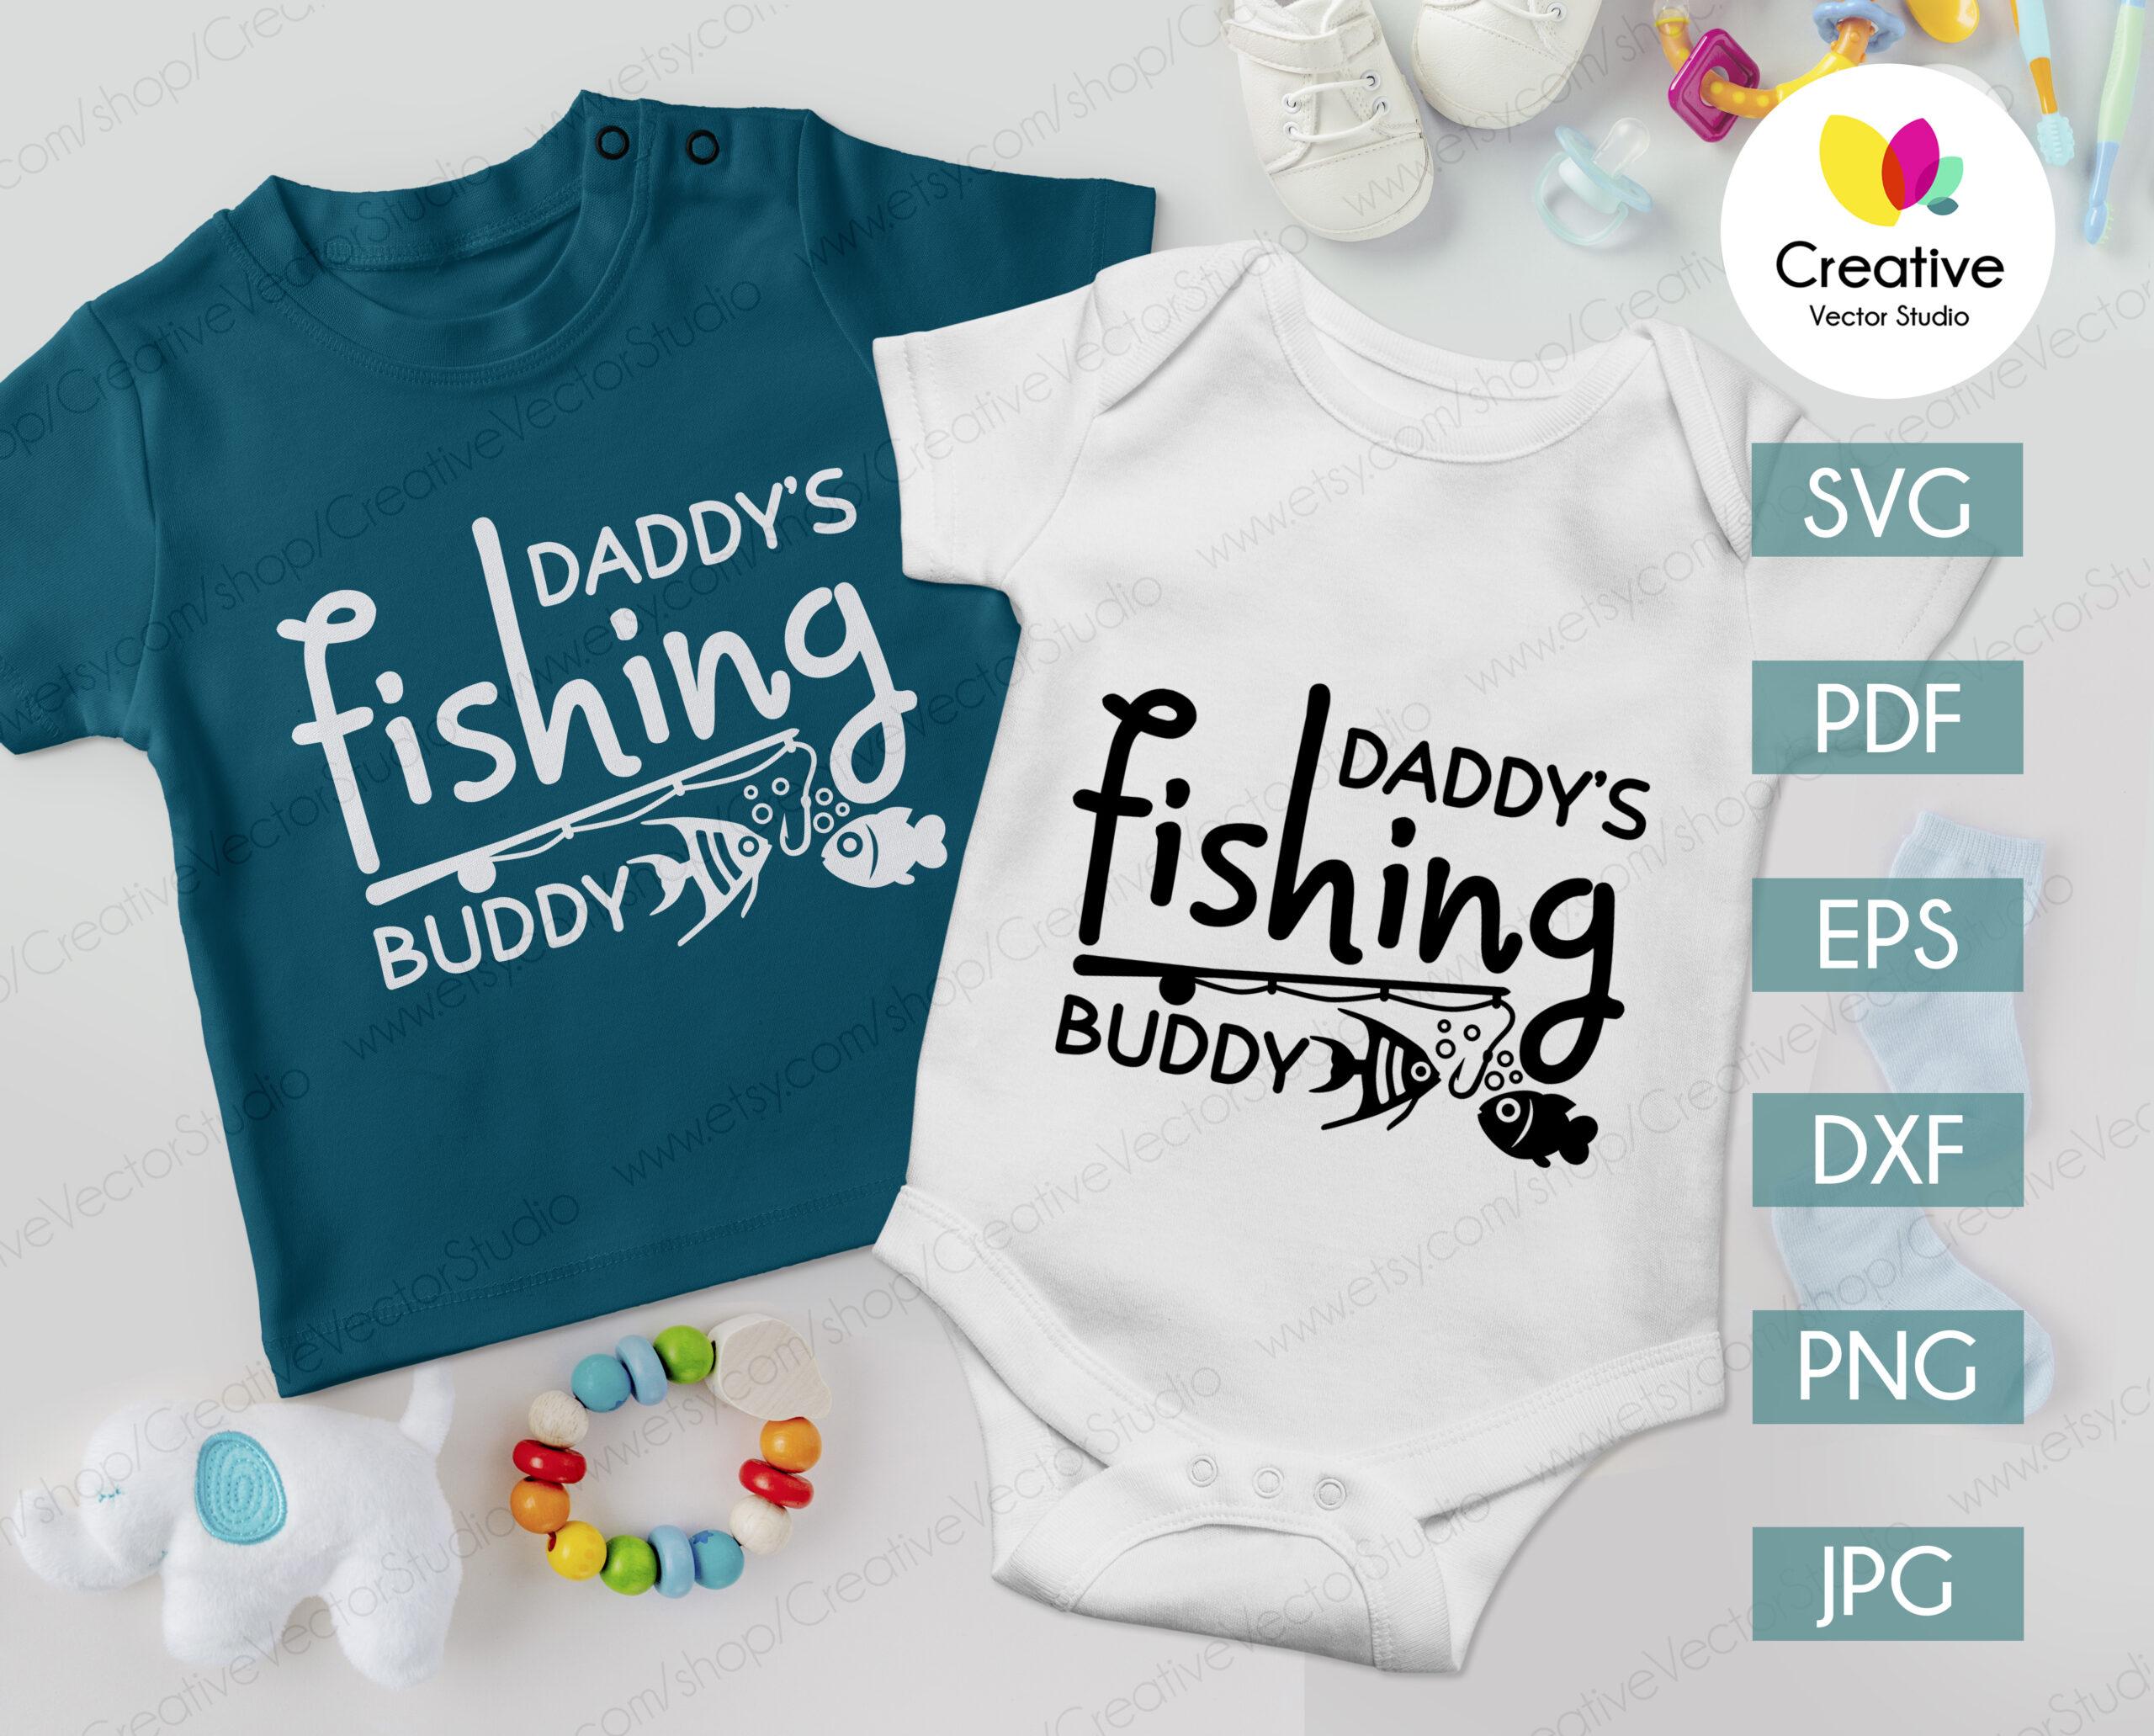 Download Daddy S Fishing Buddy Svg Creative Vector Studio